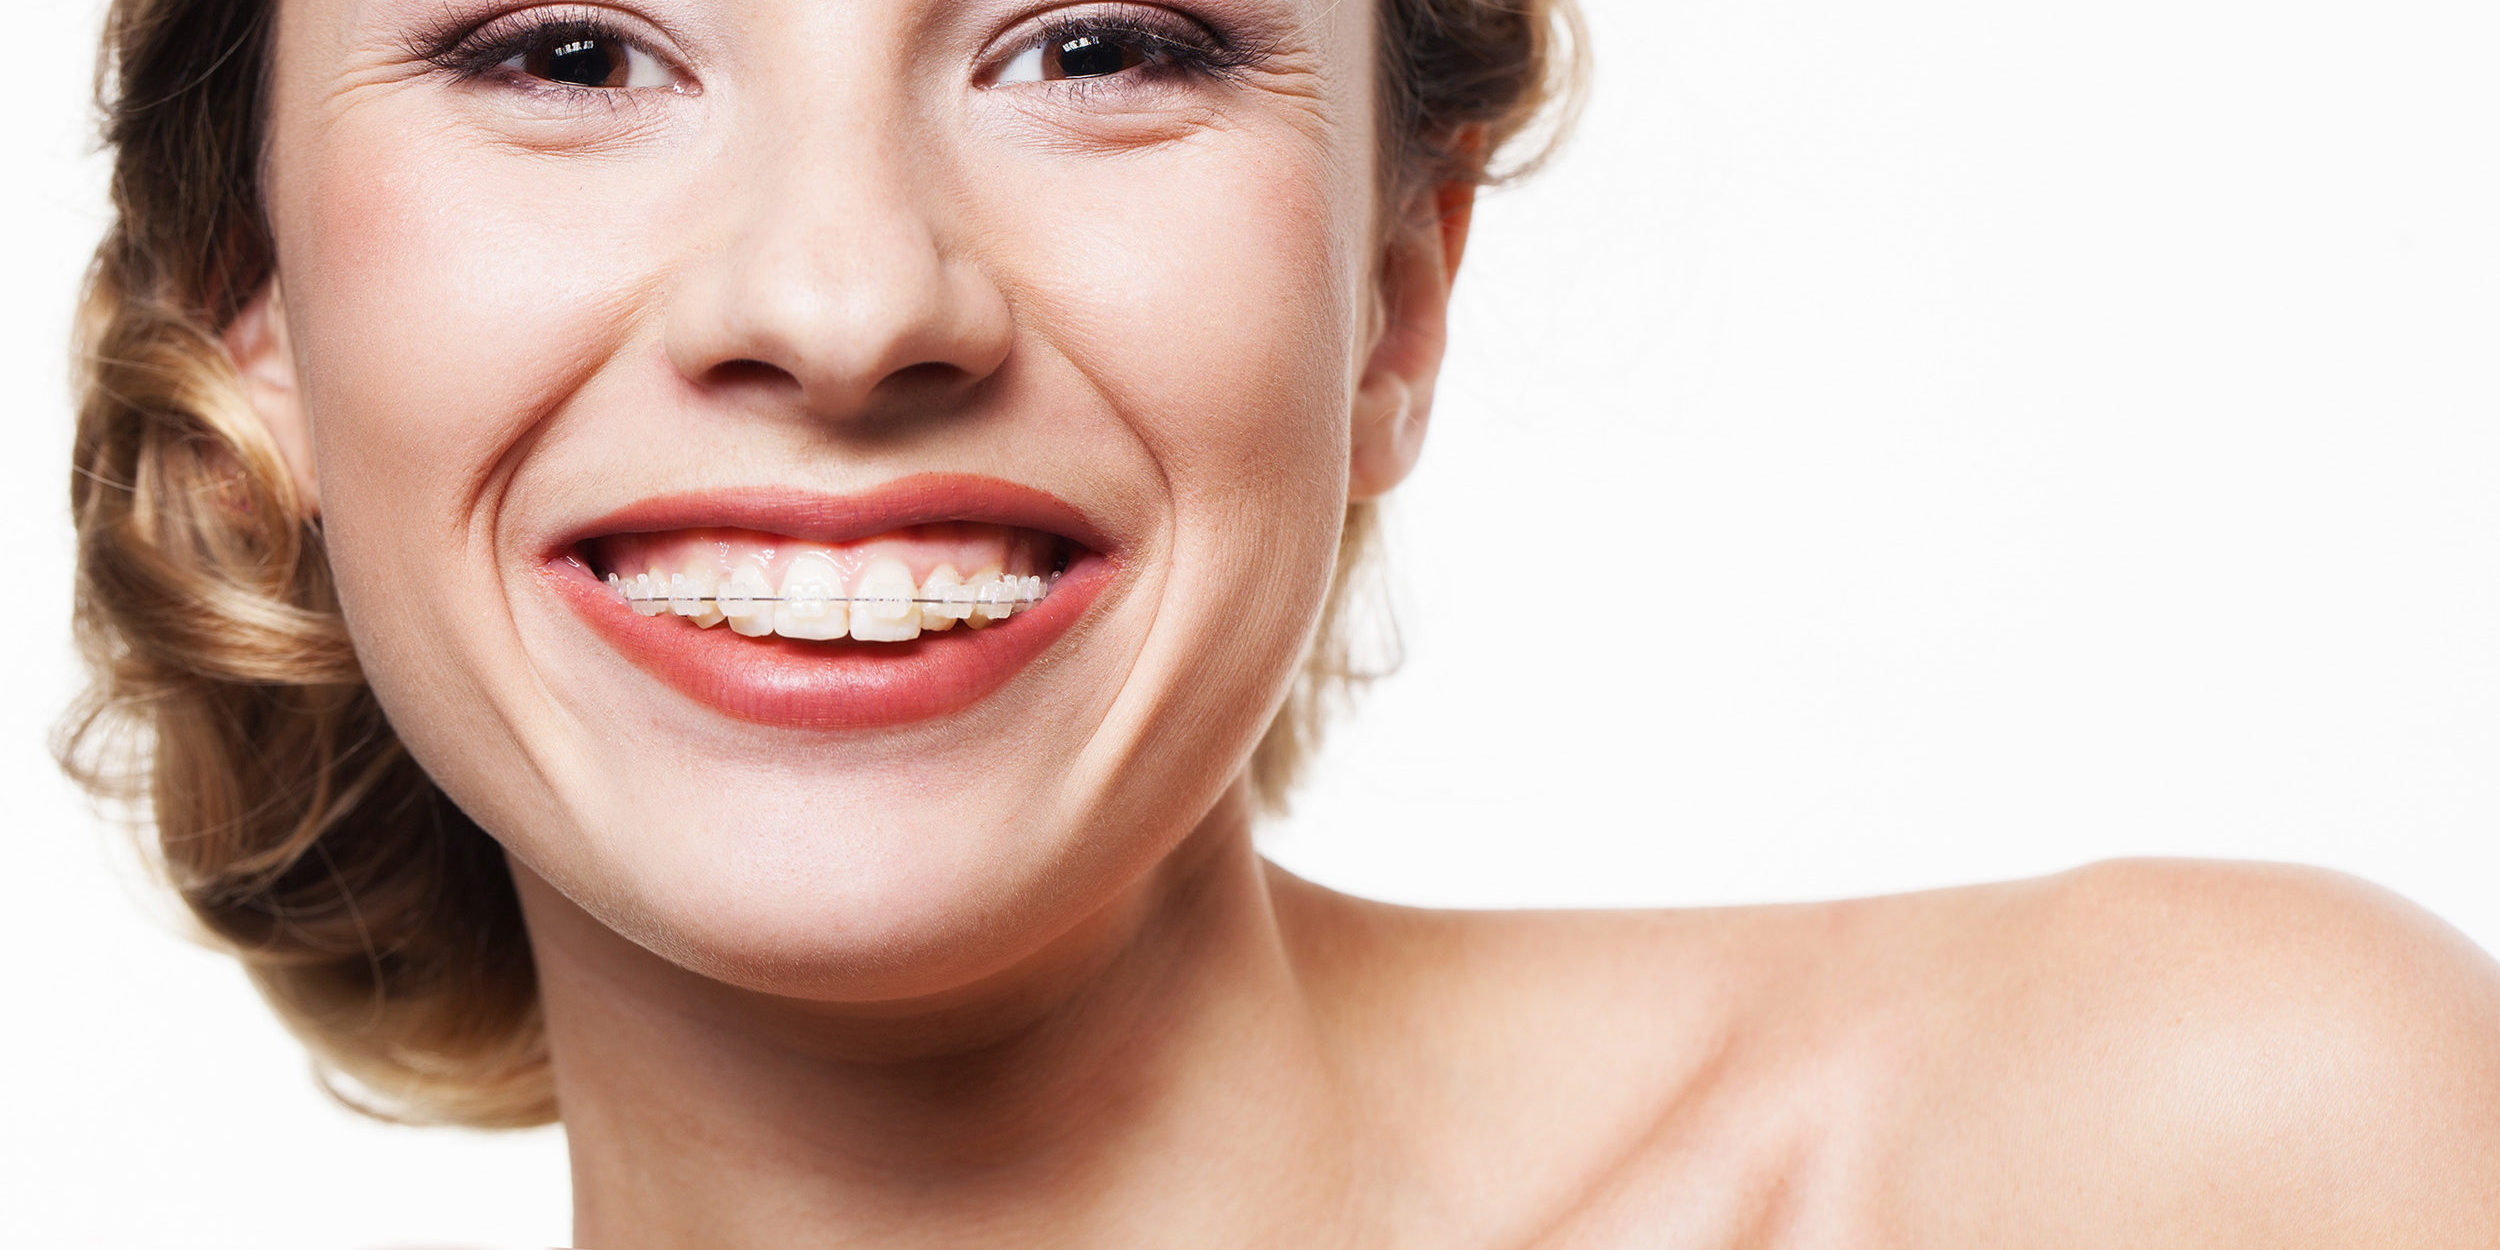 C mo es la ortodoncia est tica o de zafiro bonom dicoblog - Hemorroides alimentos prohibidos ...